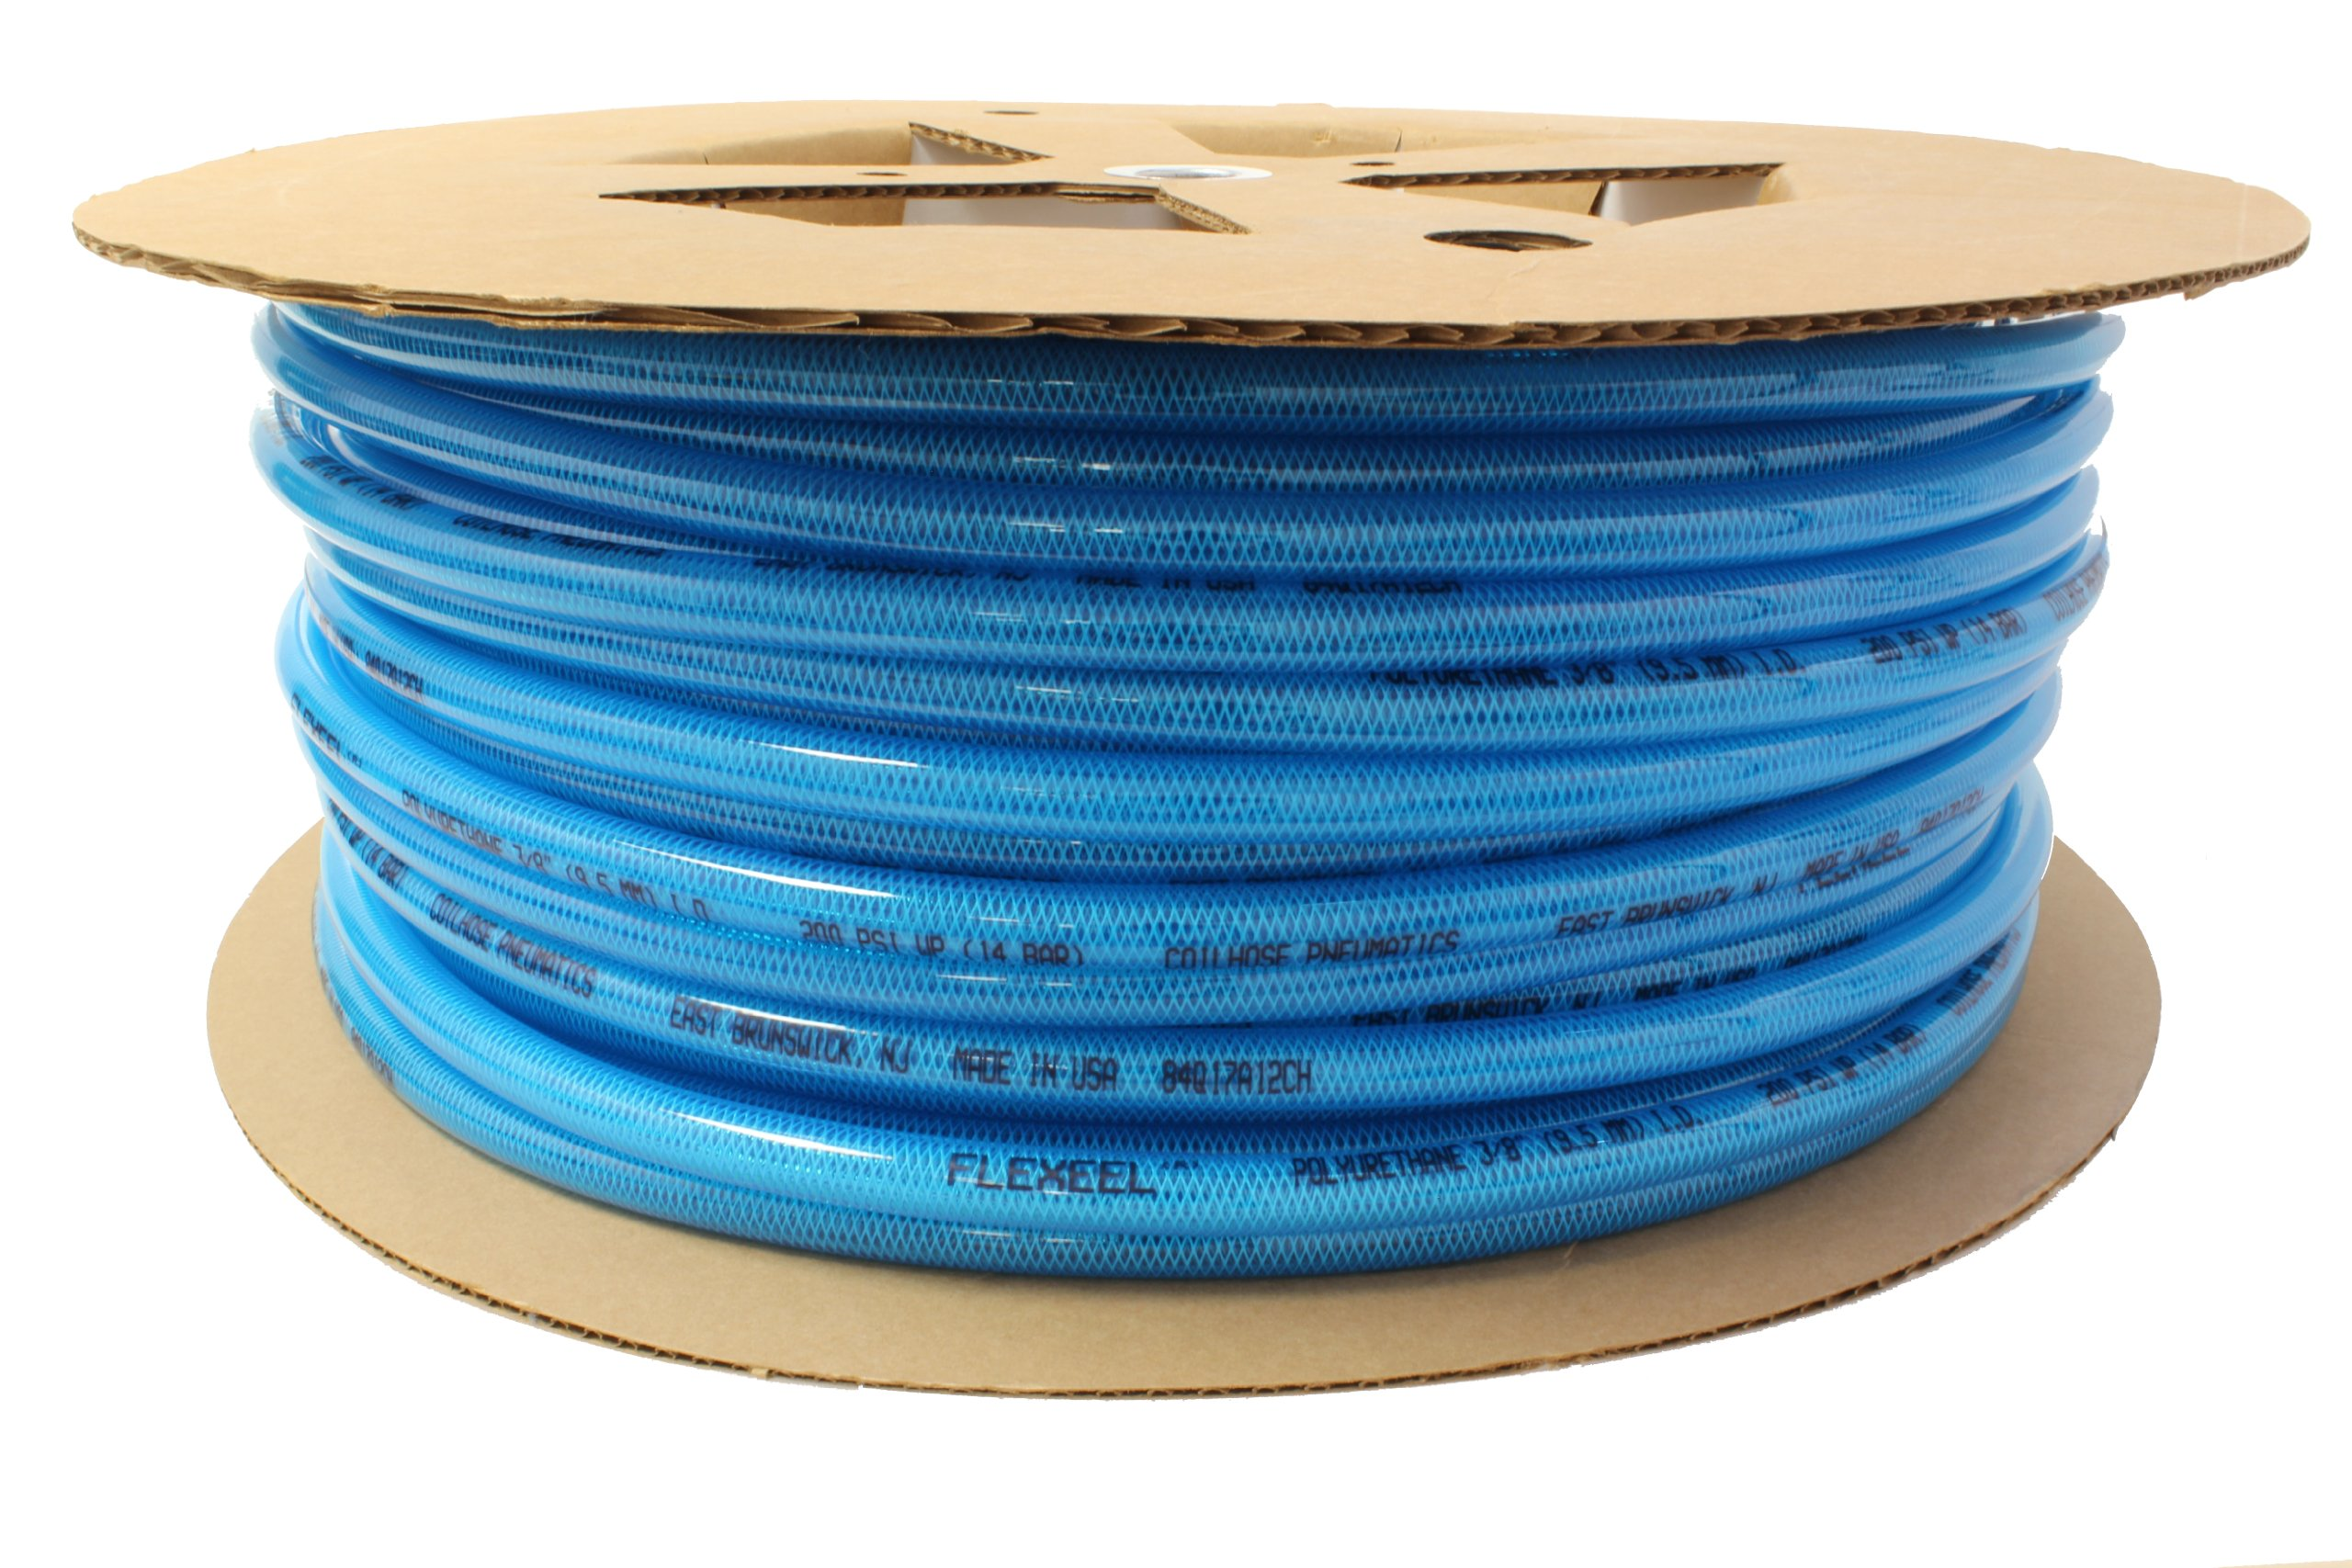 Coilhose Pneumatics PFE6200T Flexeel Reinforced Polyurethane Air Hose, 3/8-Inch ID, 200-Foot Length, No Fittings, Transparent Blue